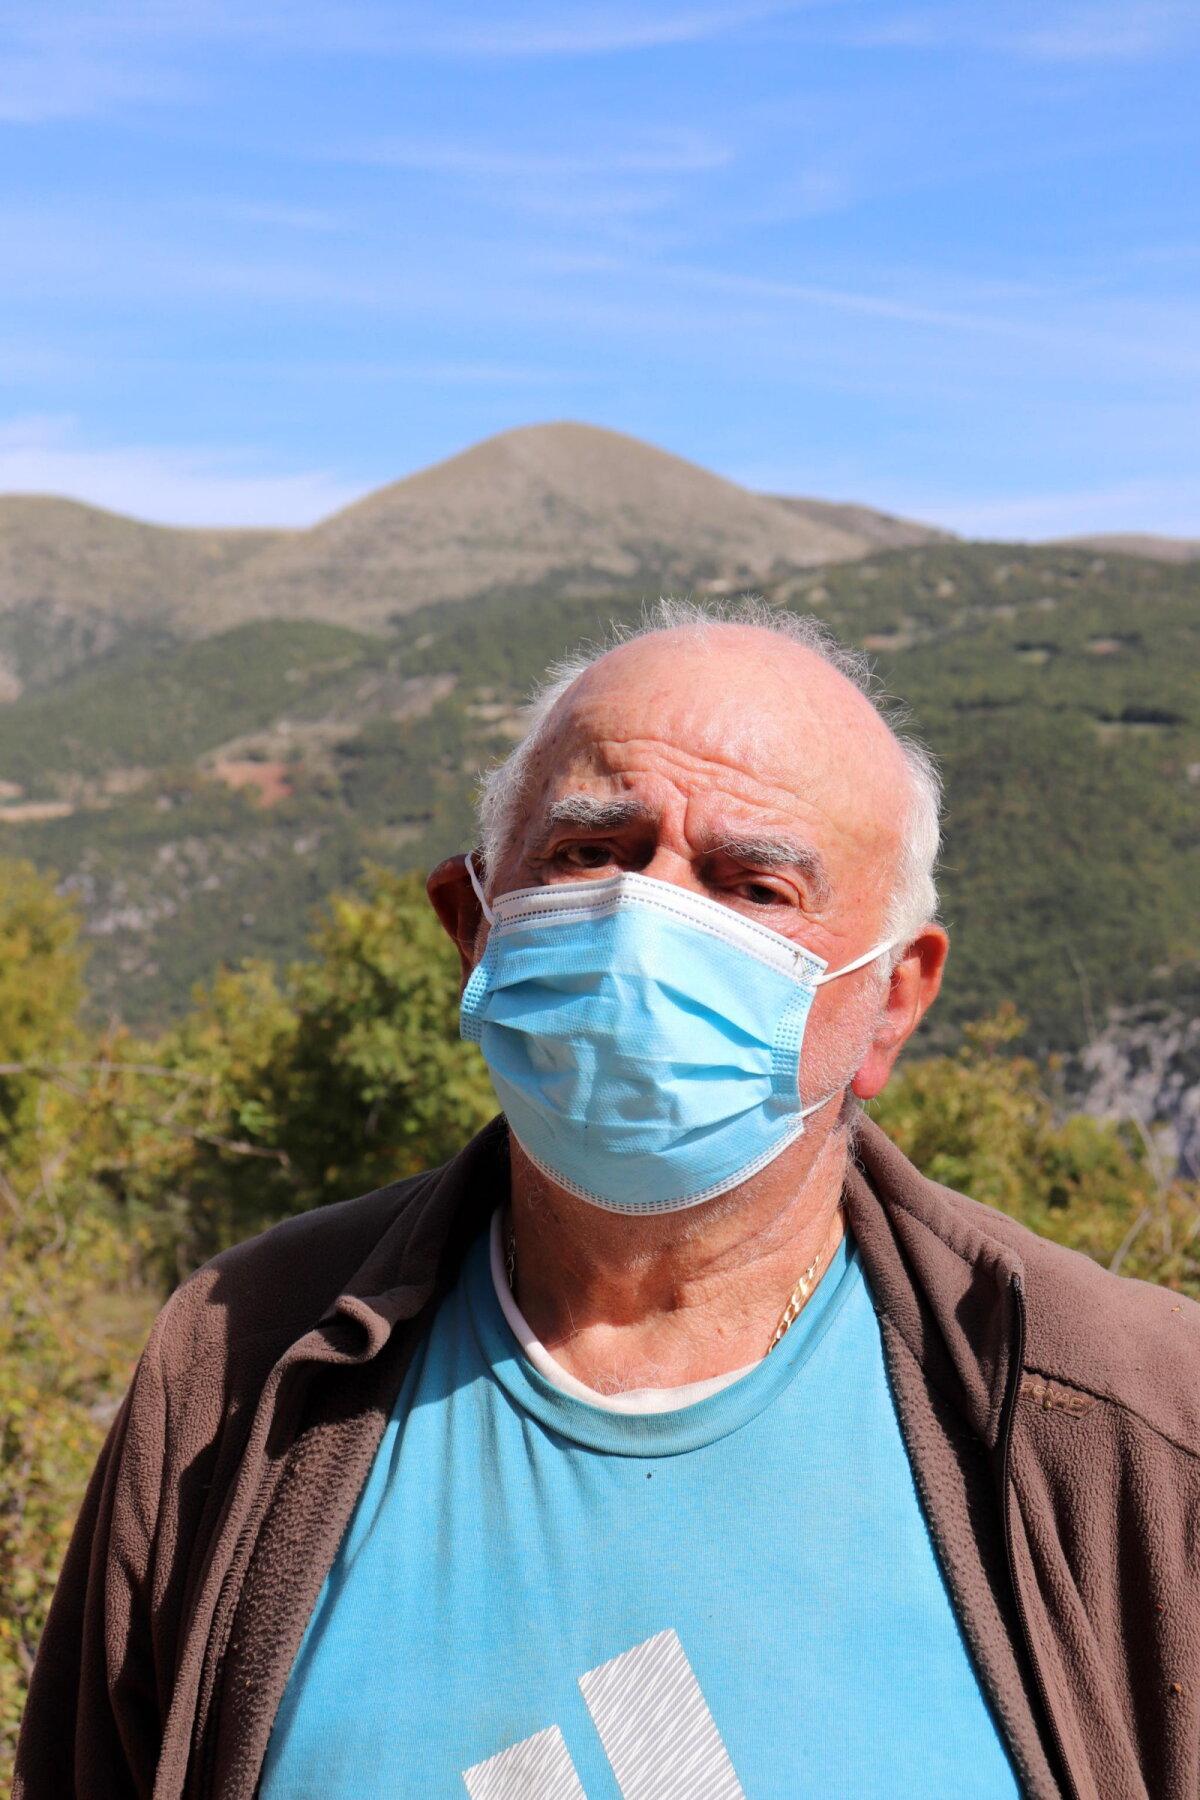 82-aastane Carilli (foto: EPA / Scanpix)